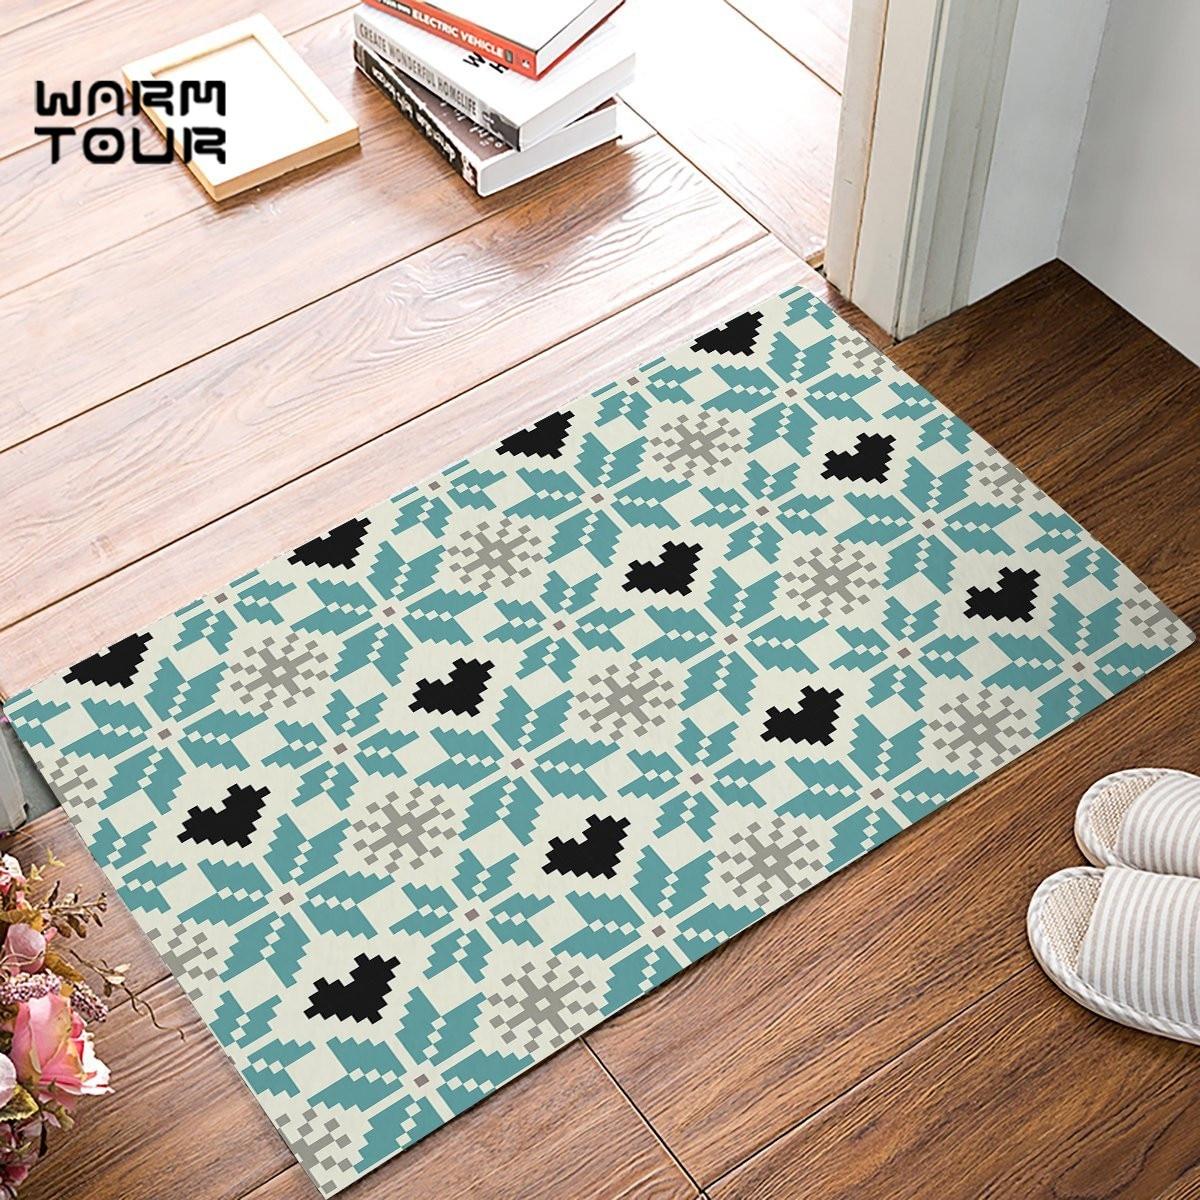 Vintage Bohemia Decorative Pattern Door Mats Kitchen Floor